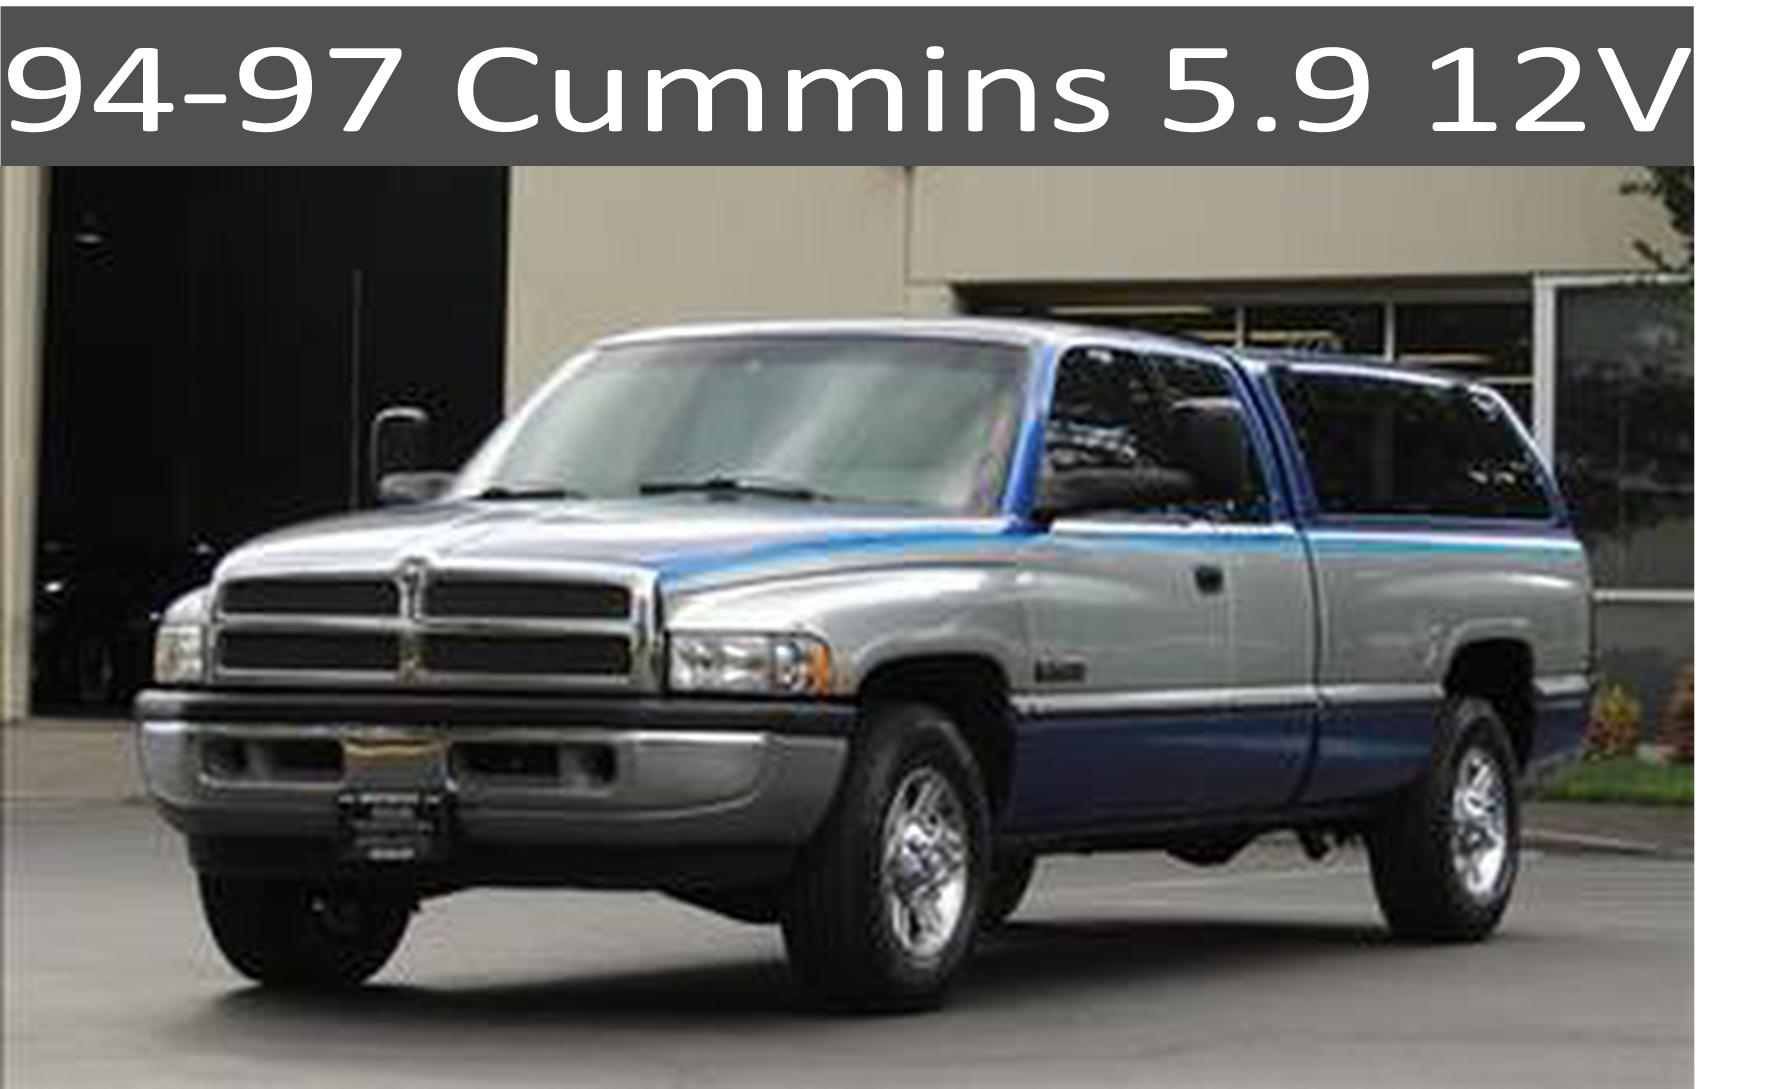 94-97 Dodge Cummins 5.9 Parts